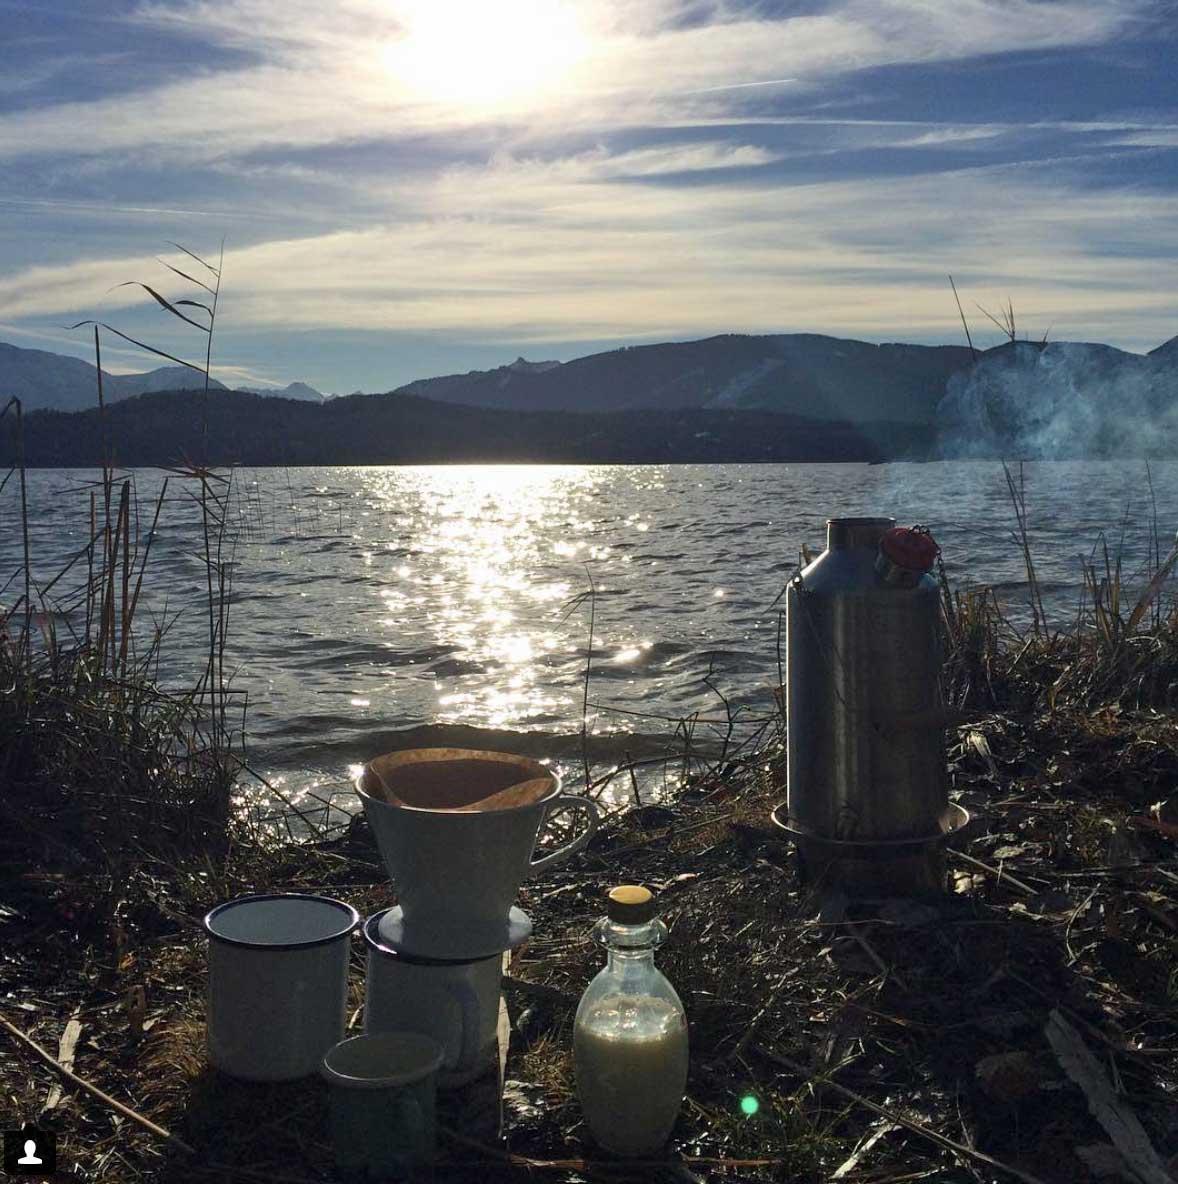 kaffee-outdoor-laura-grabert-munichmountaingirls